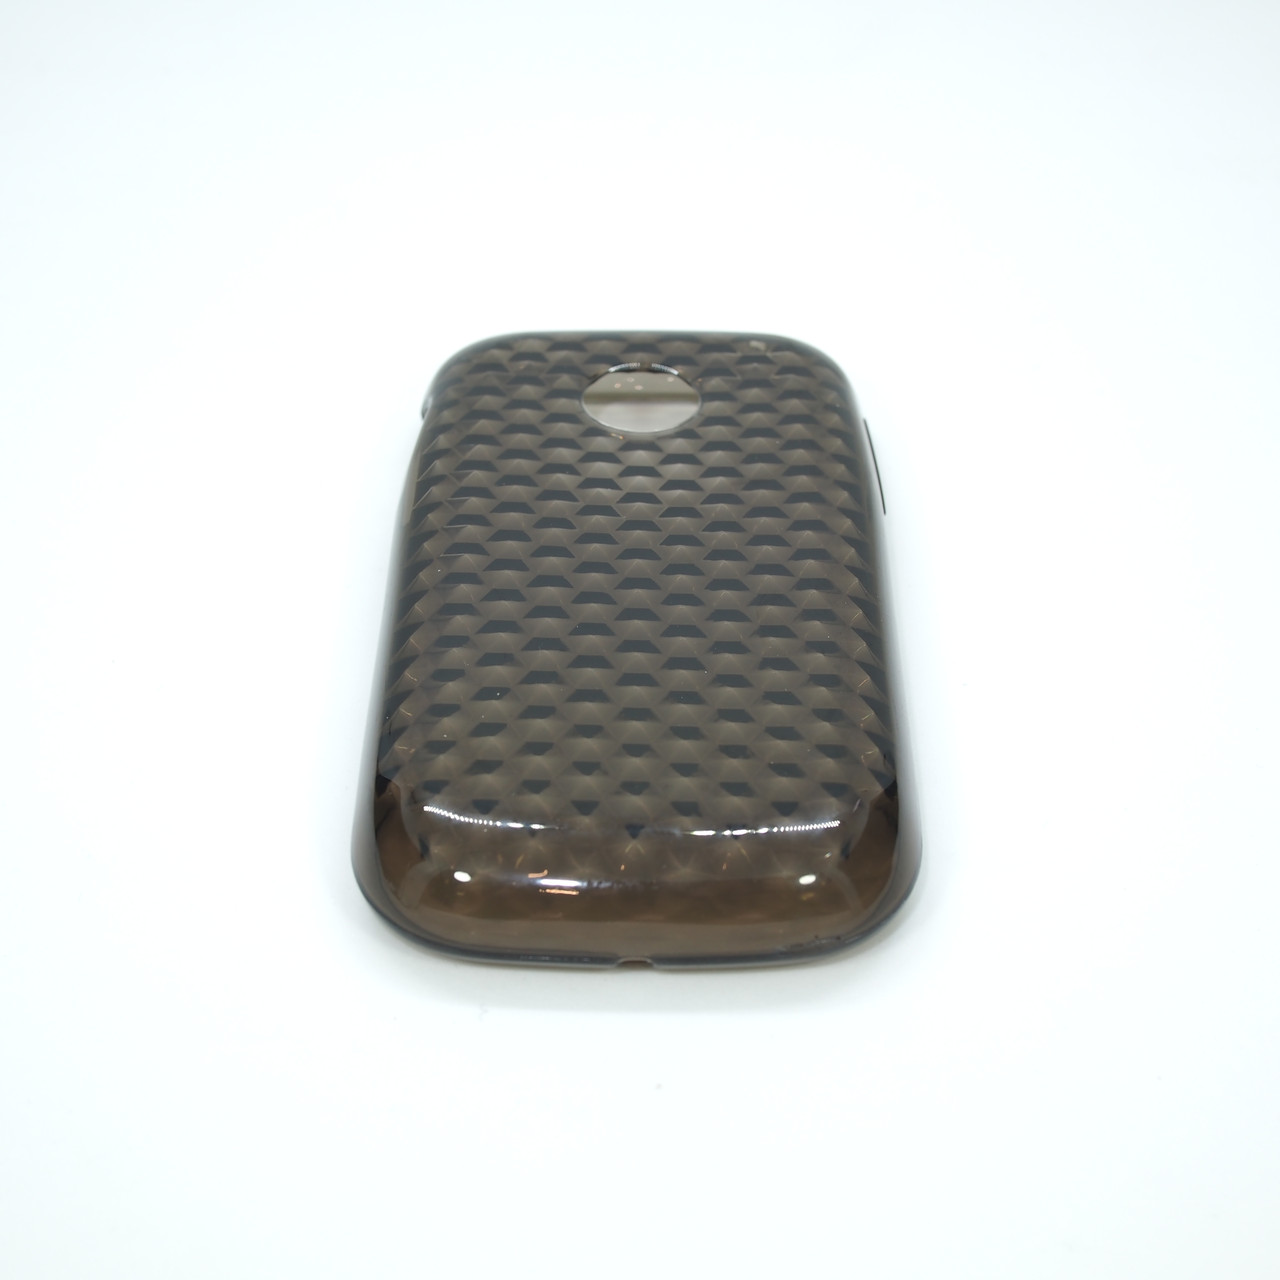 Чехлы для LG TPU Optimus P690 black диамант Для телефона